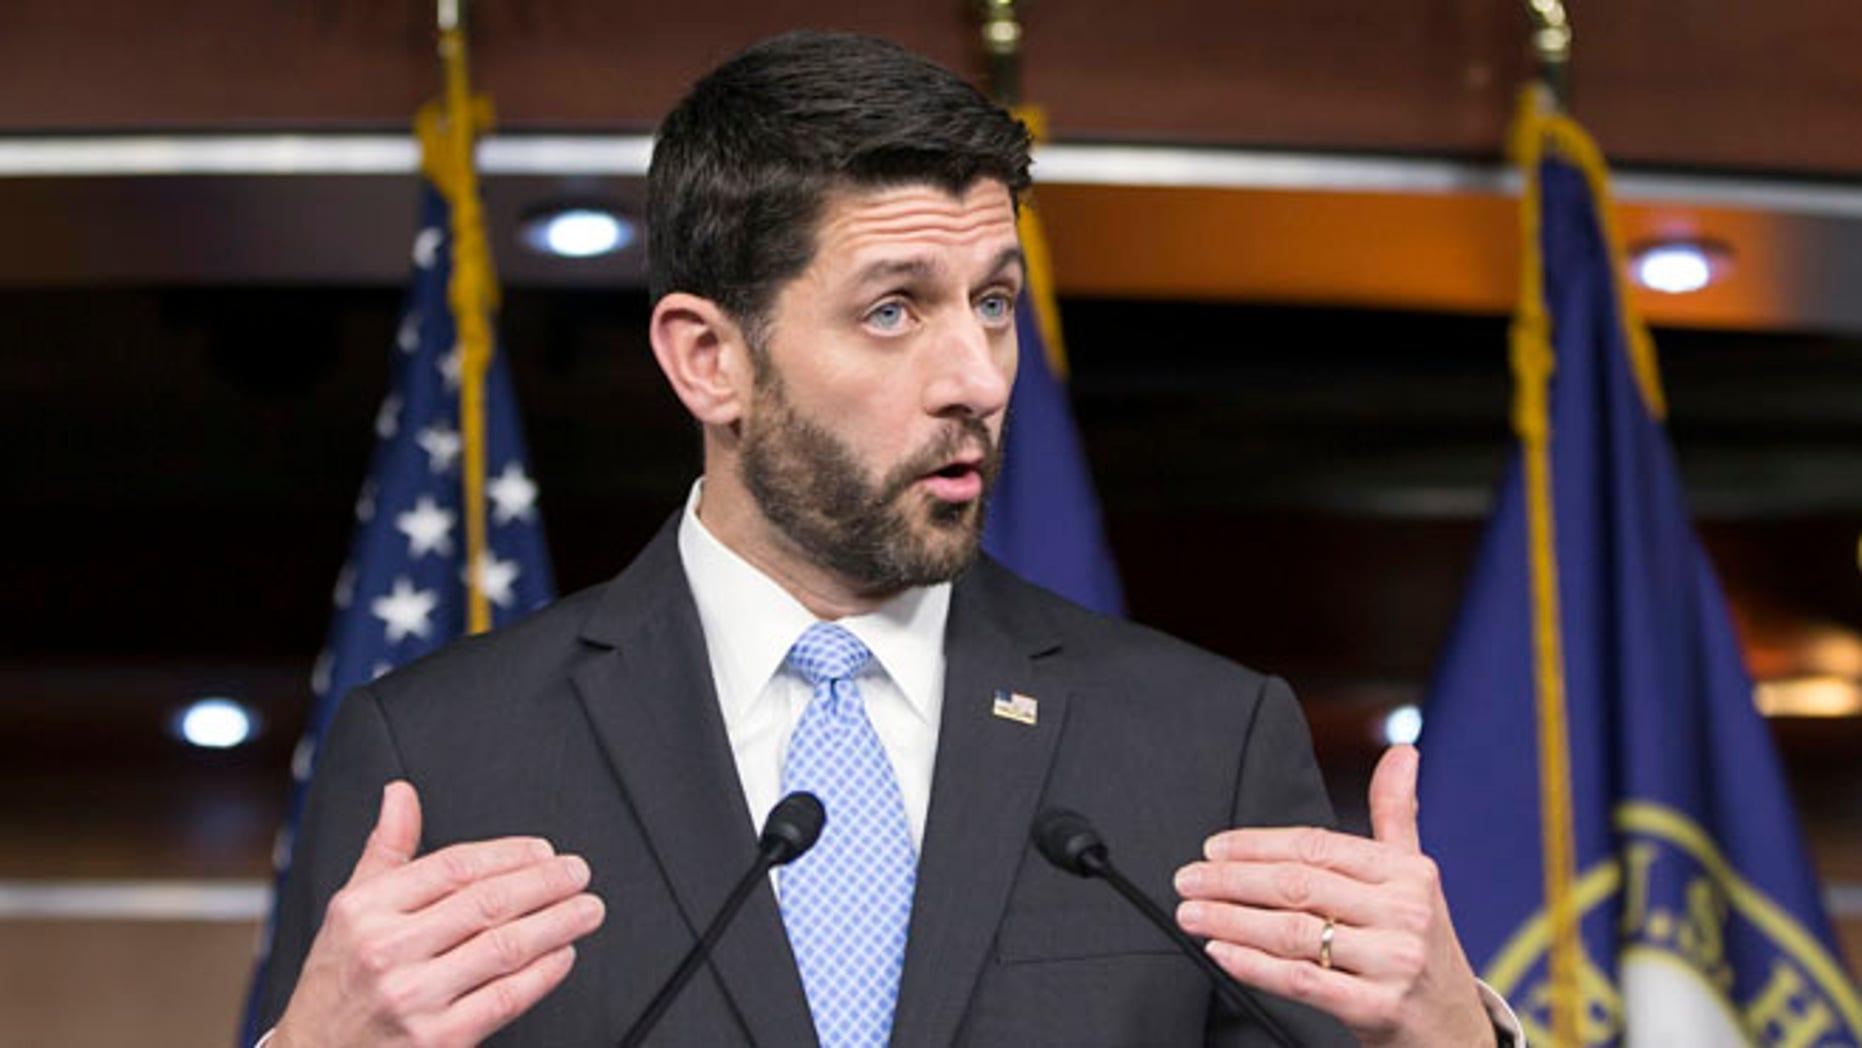 FILE: Dec. 17, 2015: House Speaker Rep. Paul Ryan, R-Wis., on Capitol Hill, Washington, D.C. (AP)